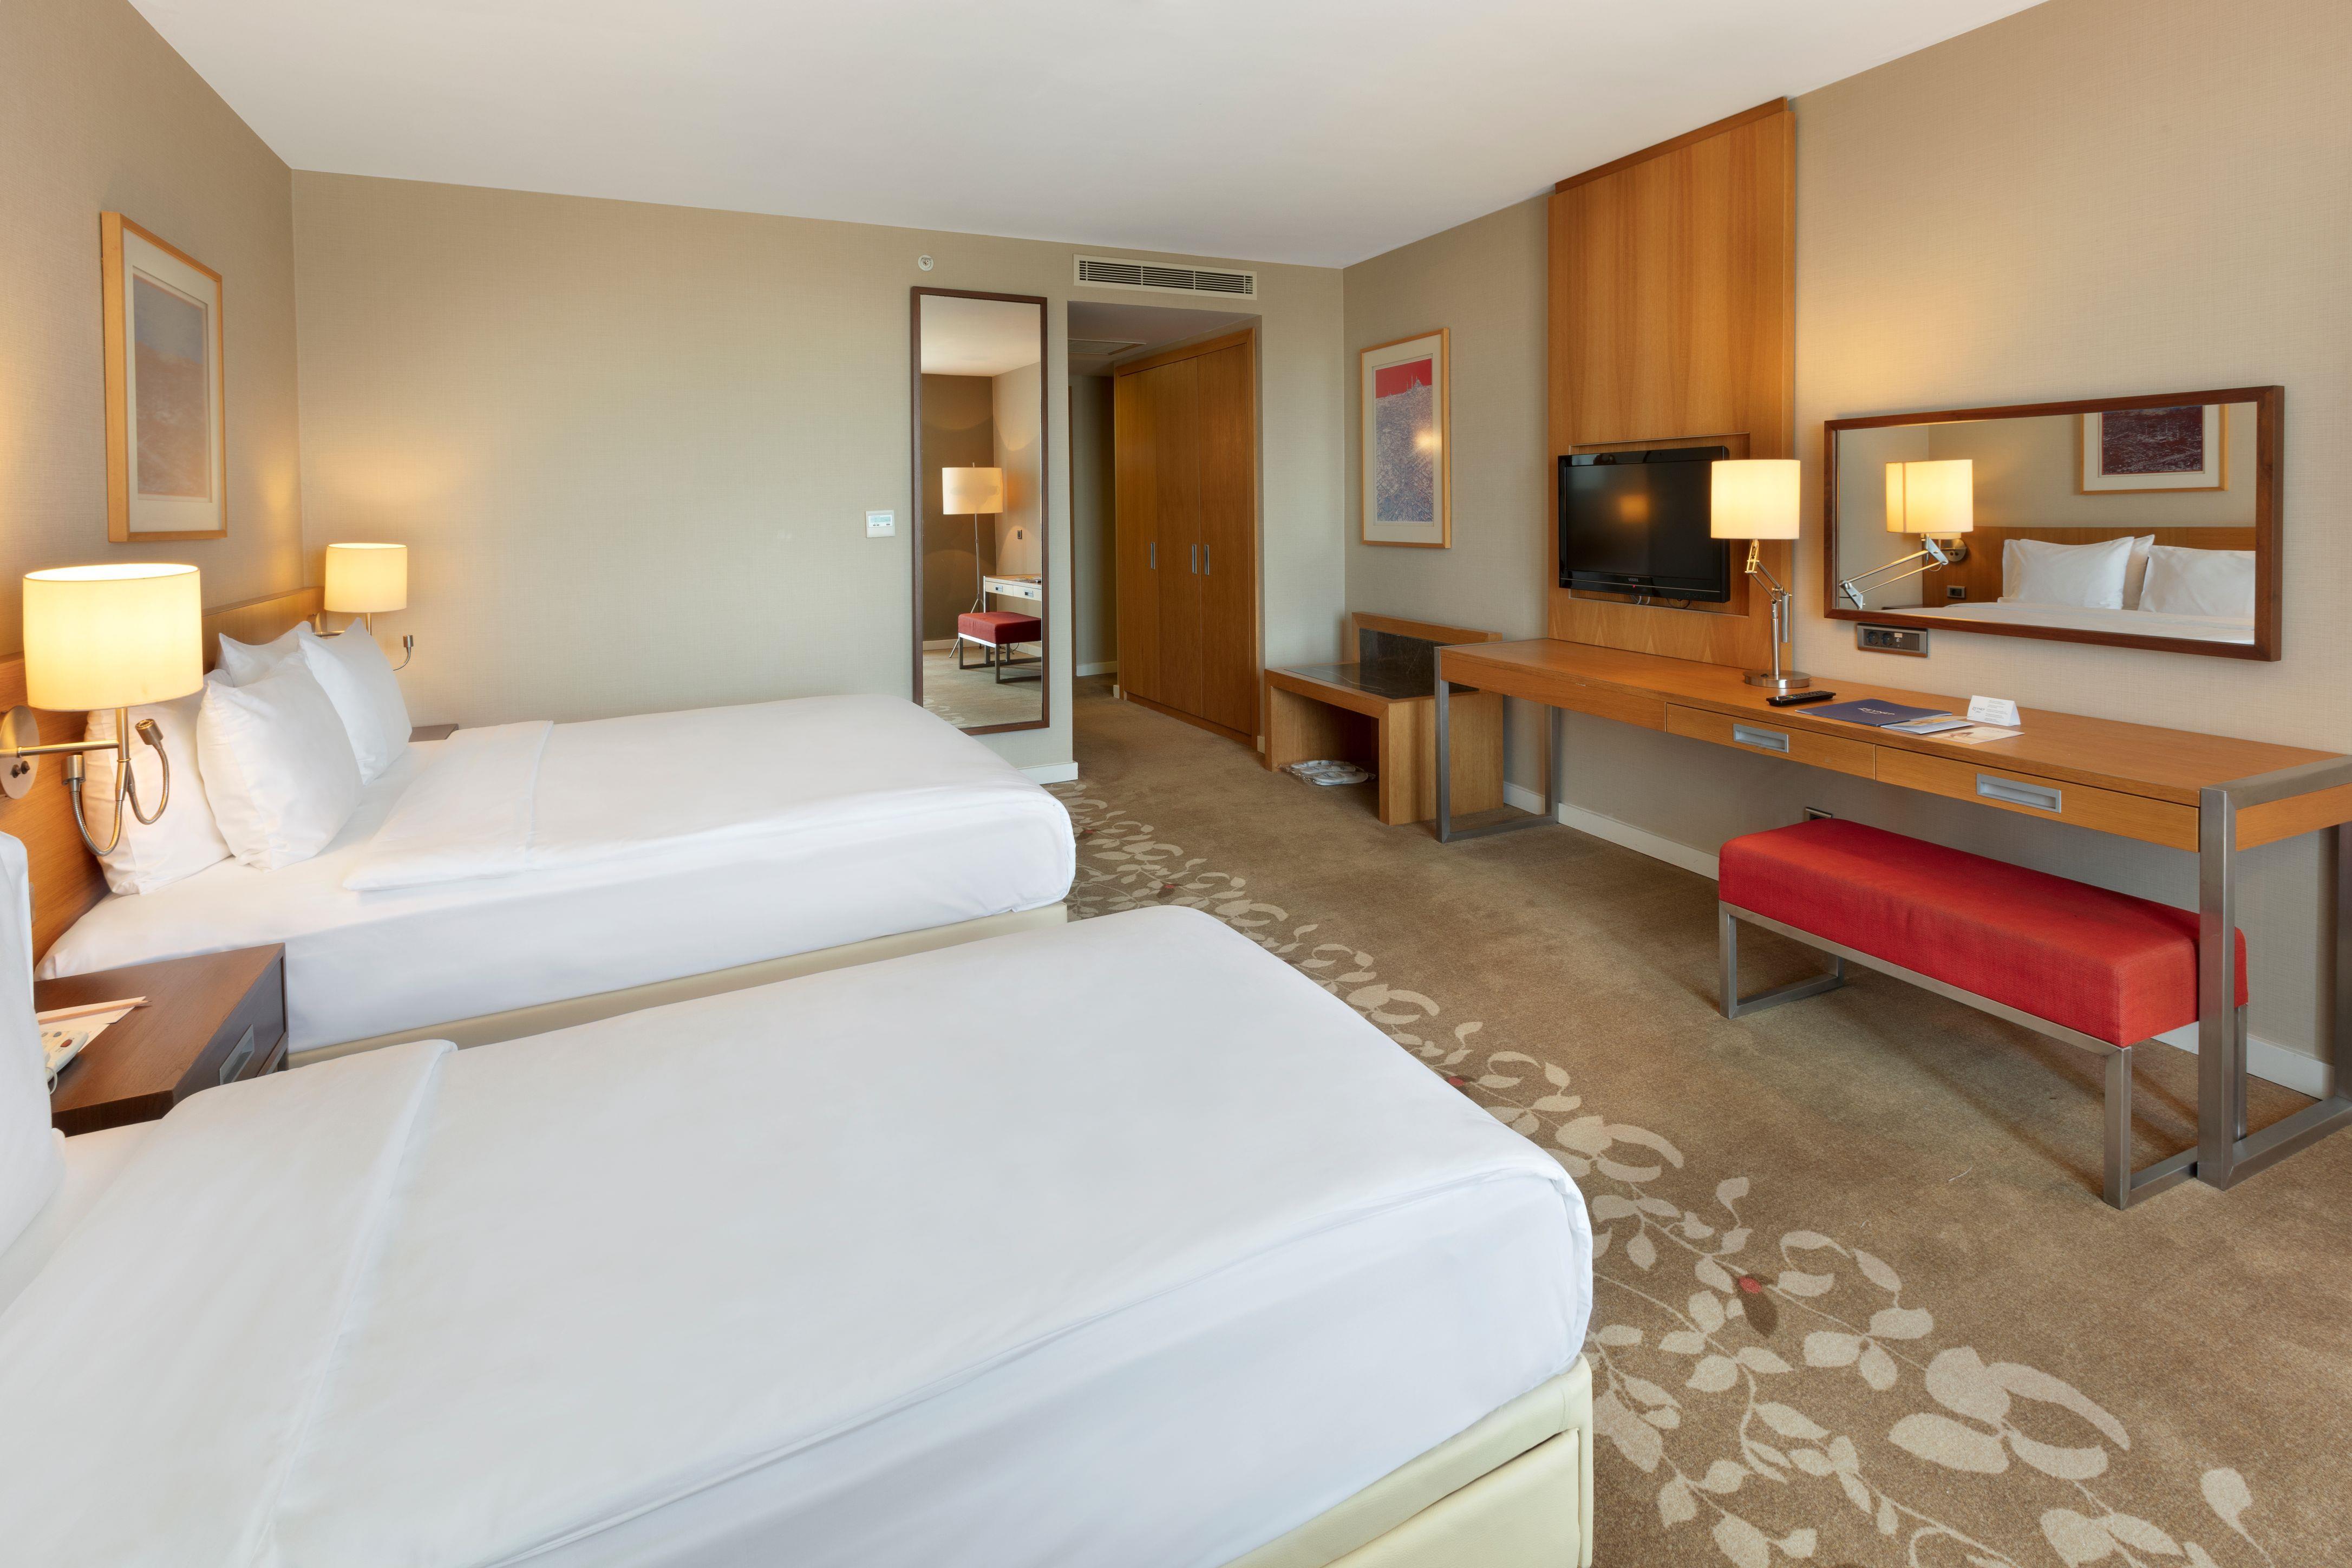 http://www.orextravel.sk/OREX/hotelphotos/zeynep-hotel-general-0019.jpg